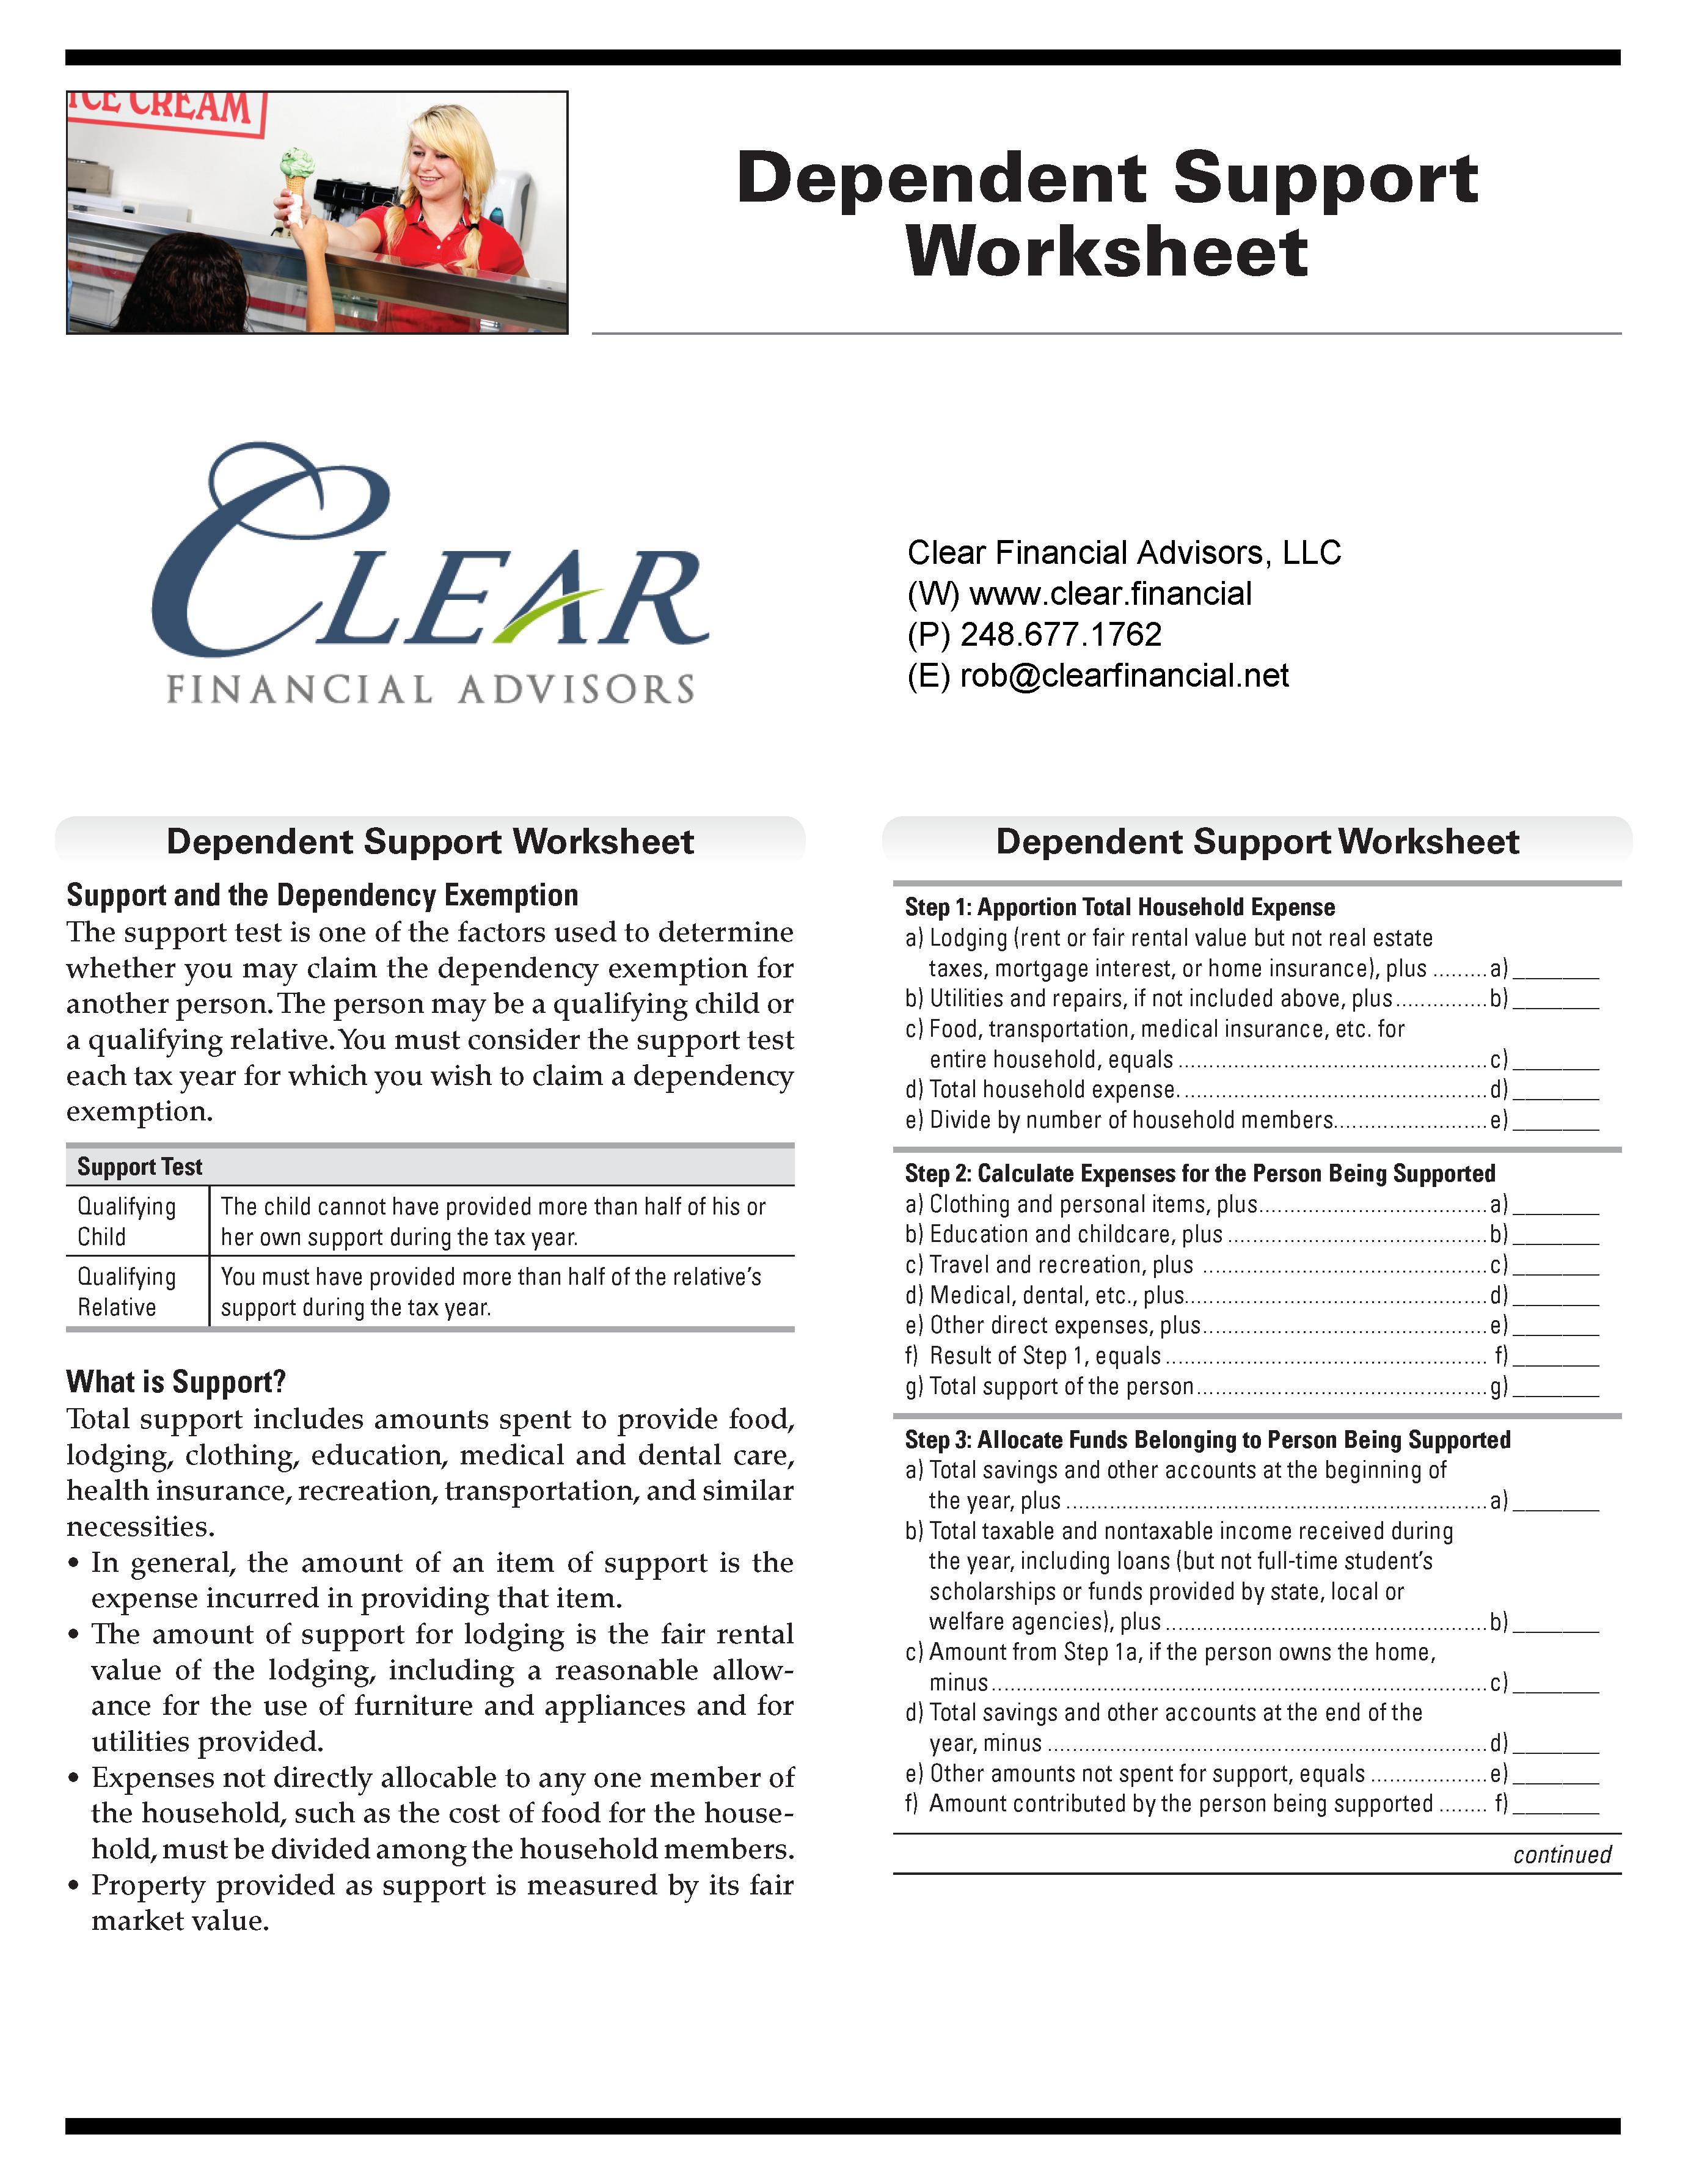 Dependent_Support_Worksheet_2016_Page_1